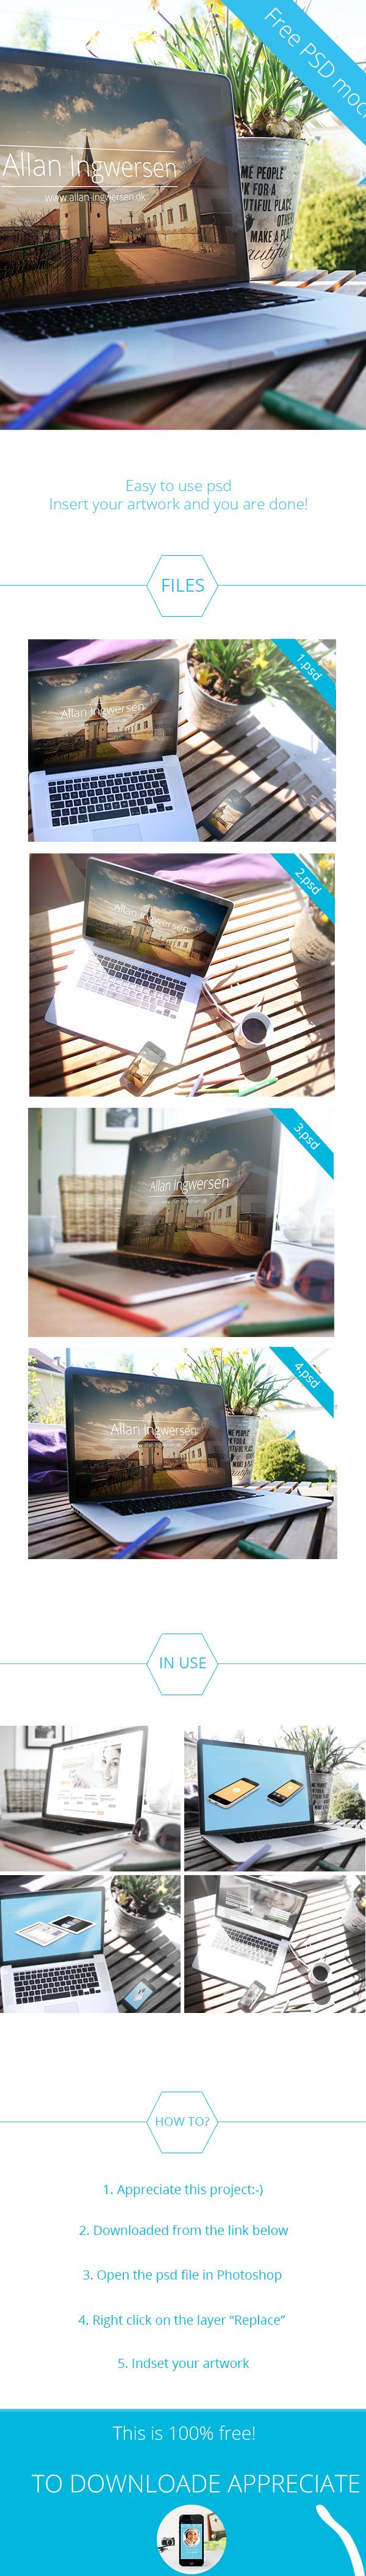 free psd psd Mockup free mockup  photoshop file macbook macbook pro iphone iphone mockup macbook mockup